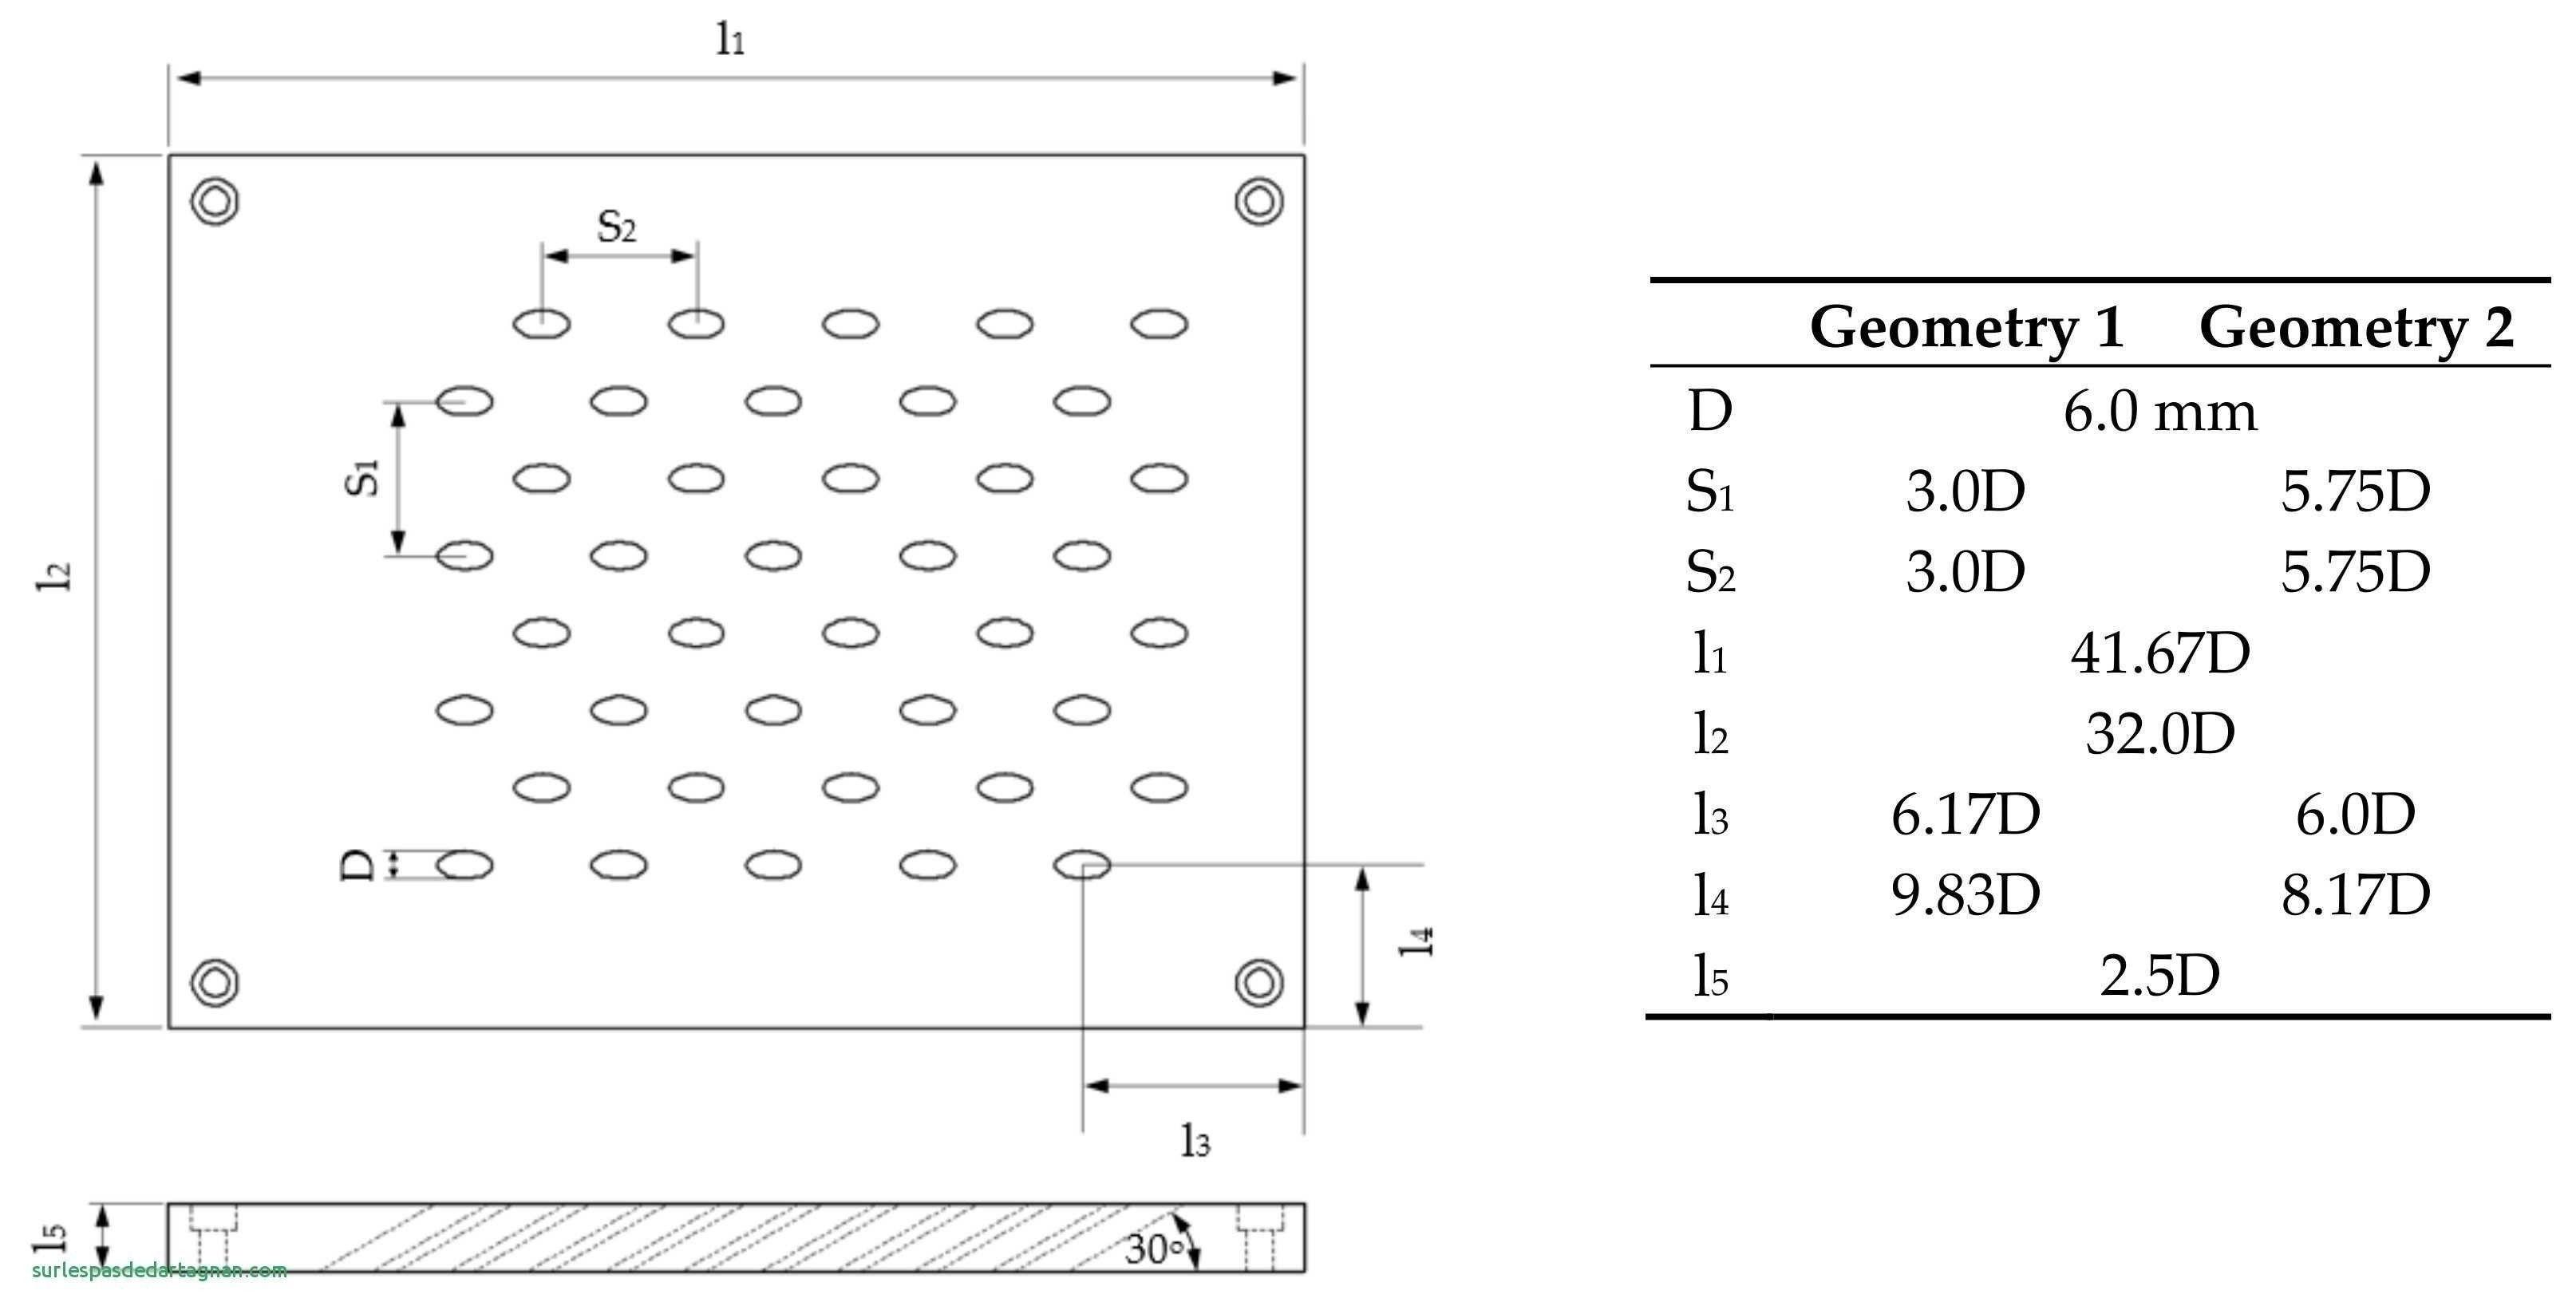 Medroxyprogesterone Calander 2019 | Calendar Template Printable  Depo Provera Chart 2020